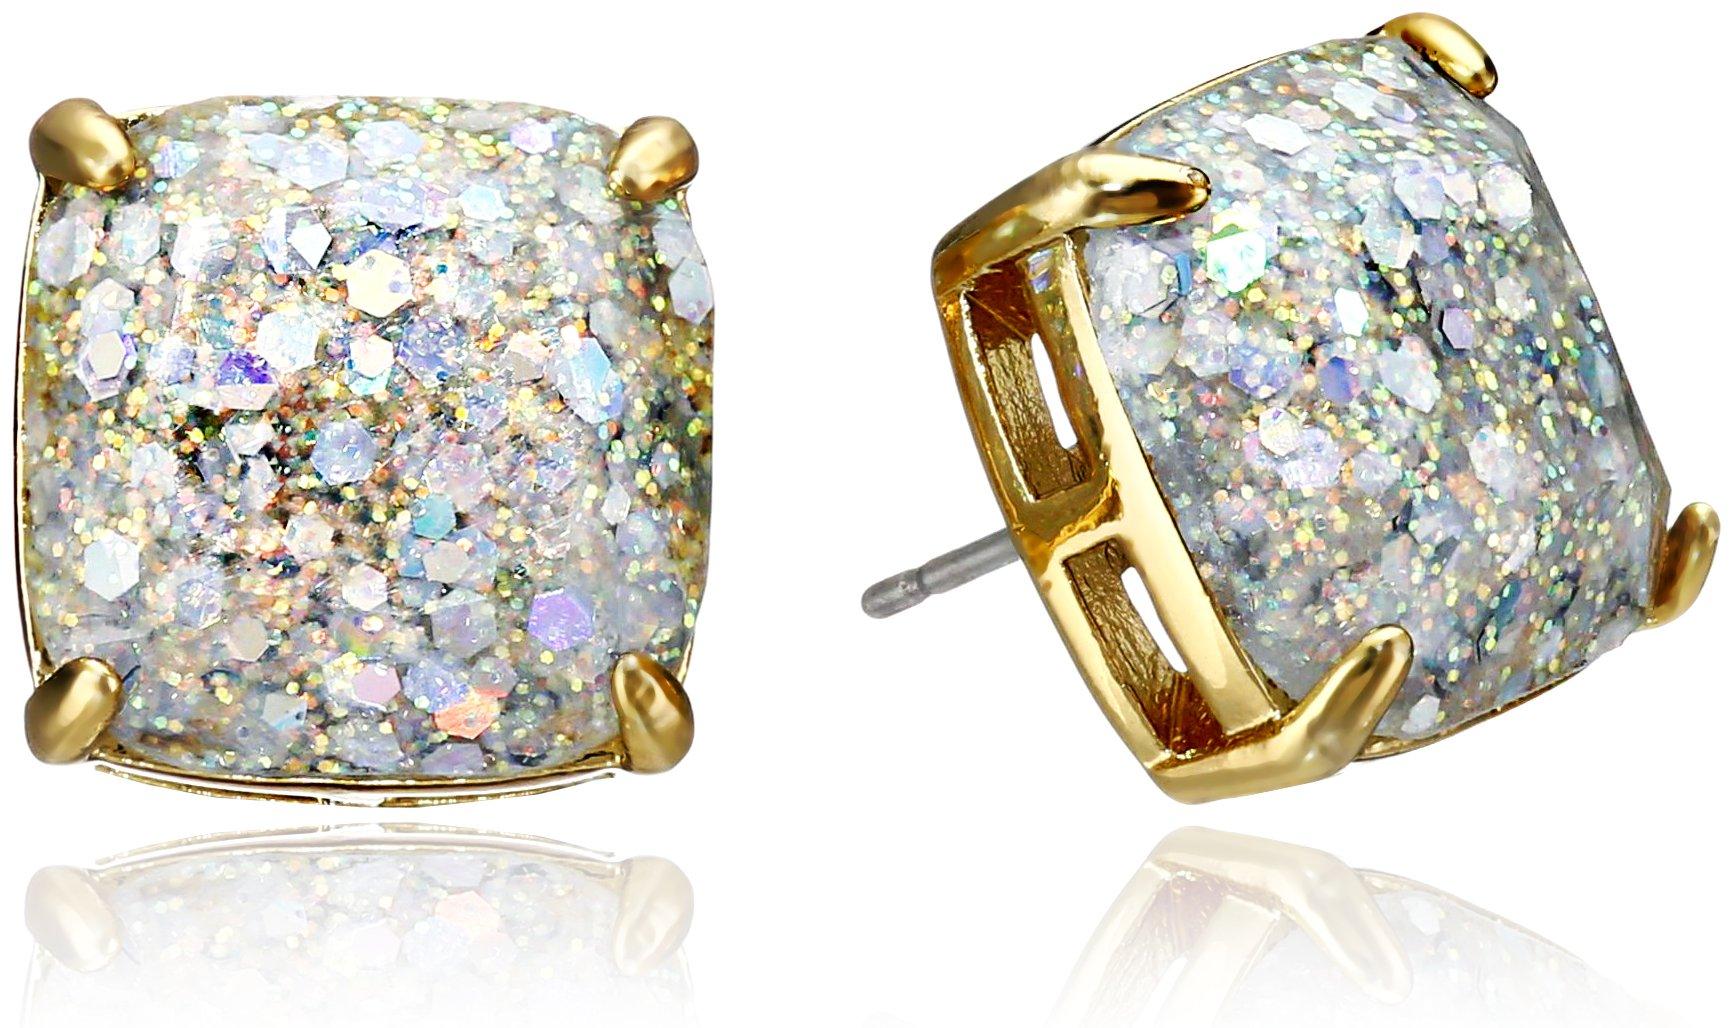 kate spade new york Small Square Opal Stud Earrings